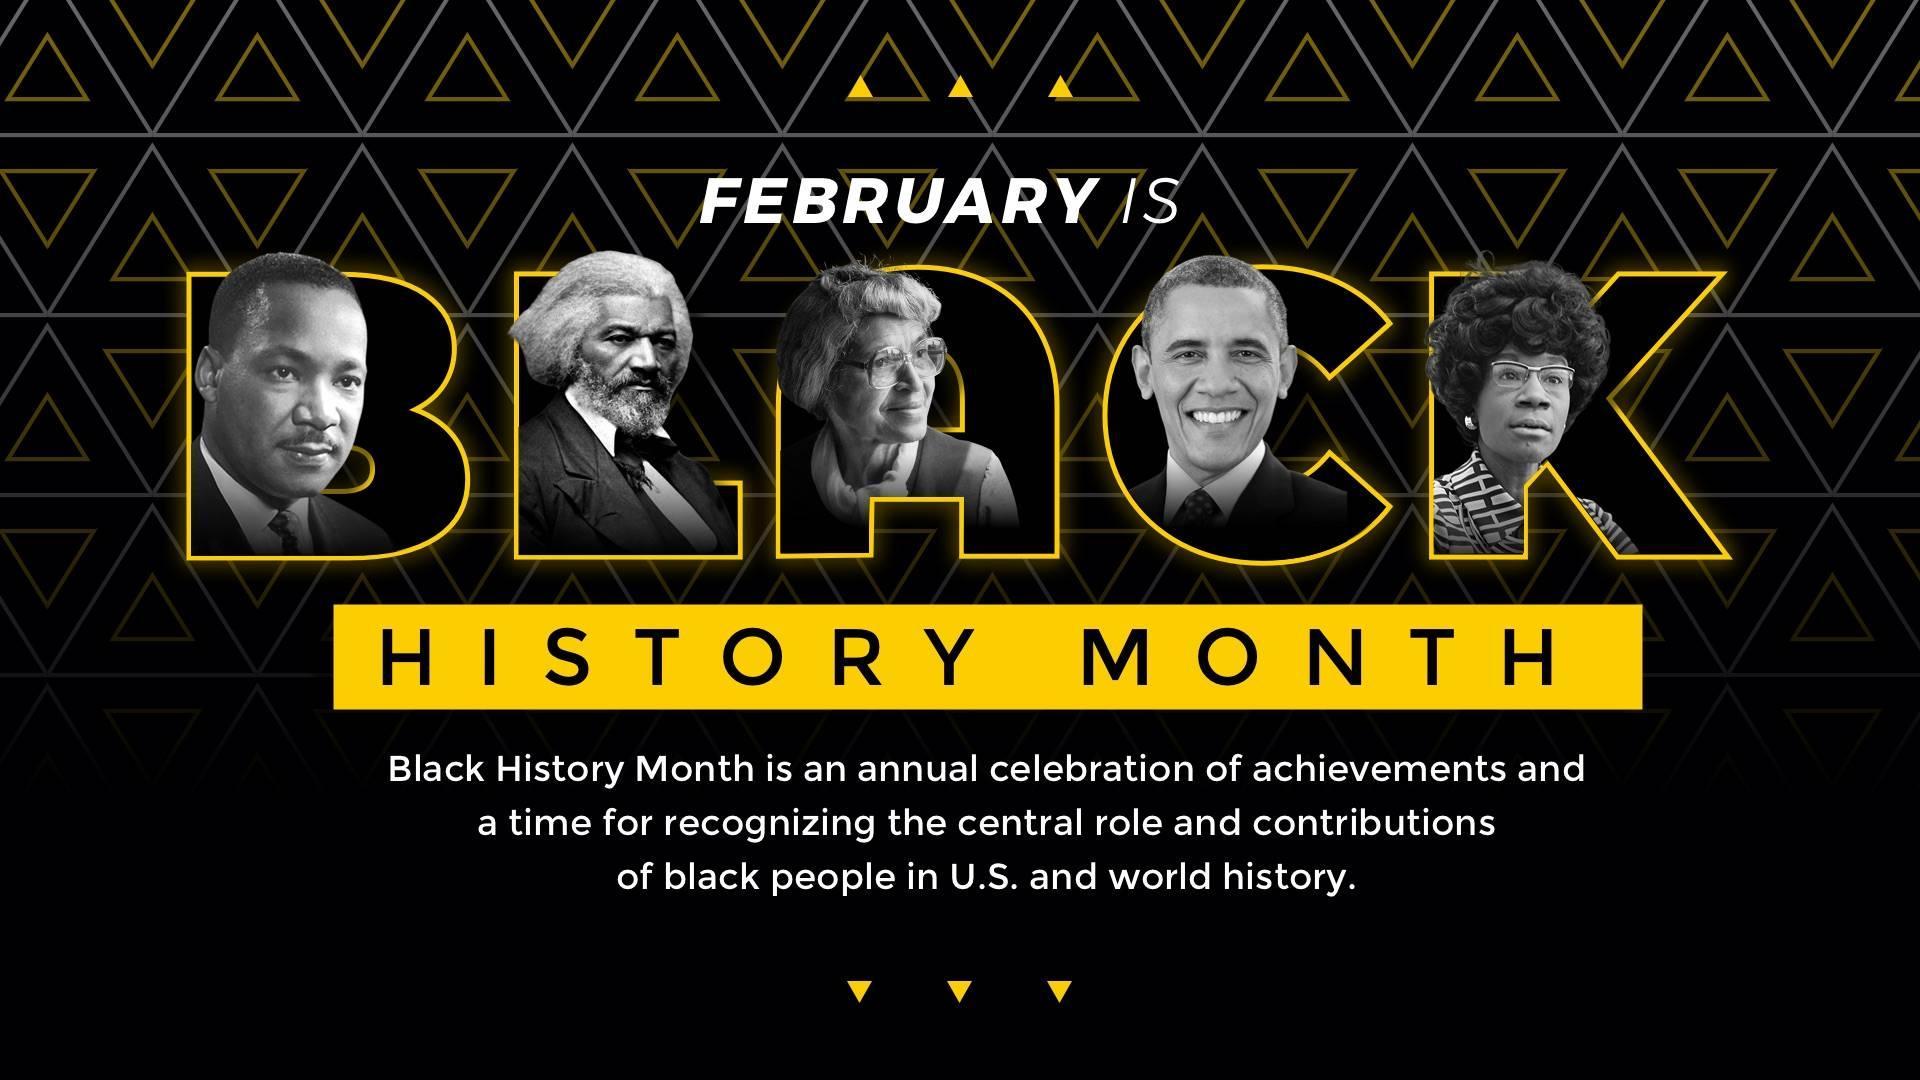 Black History Month Digital Signage Template